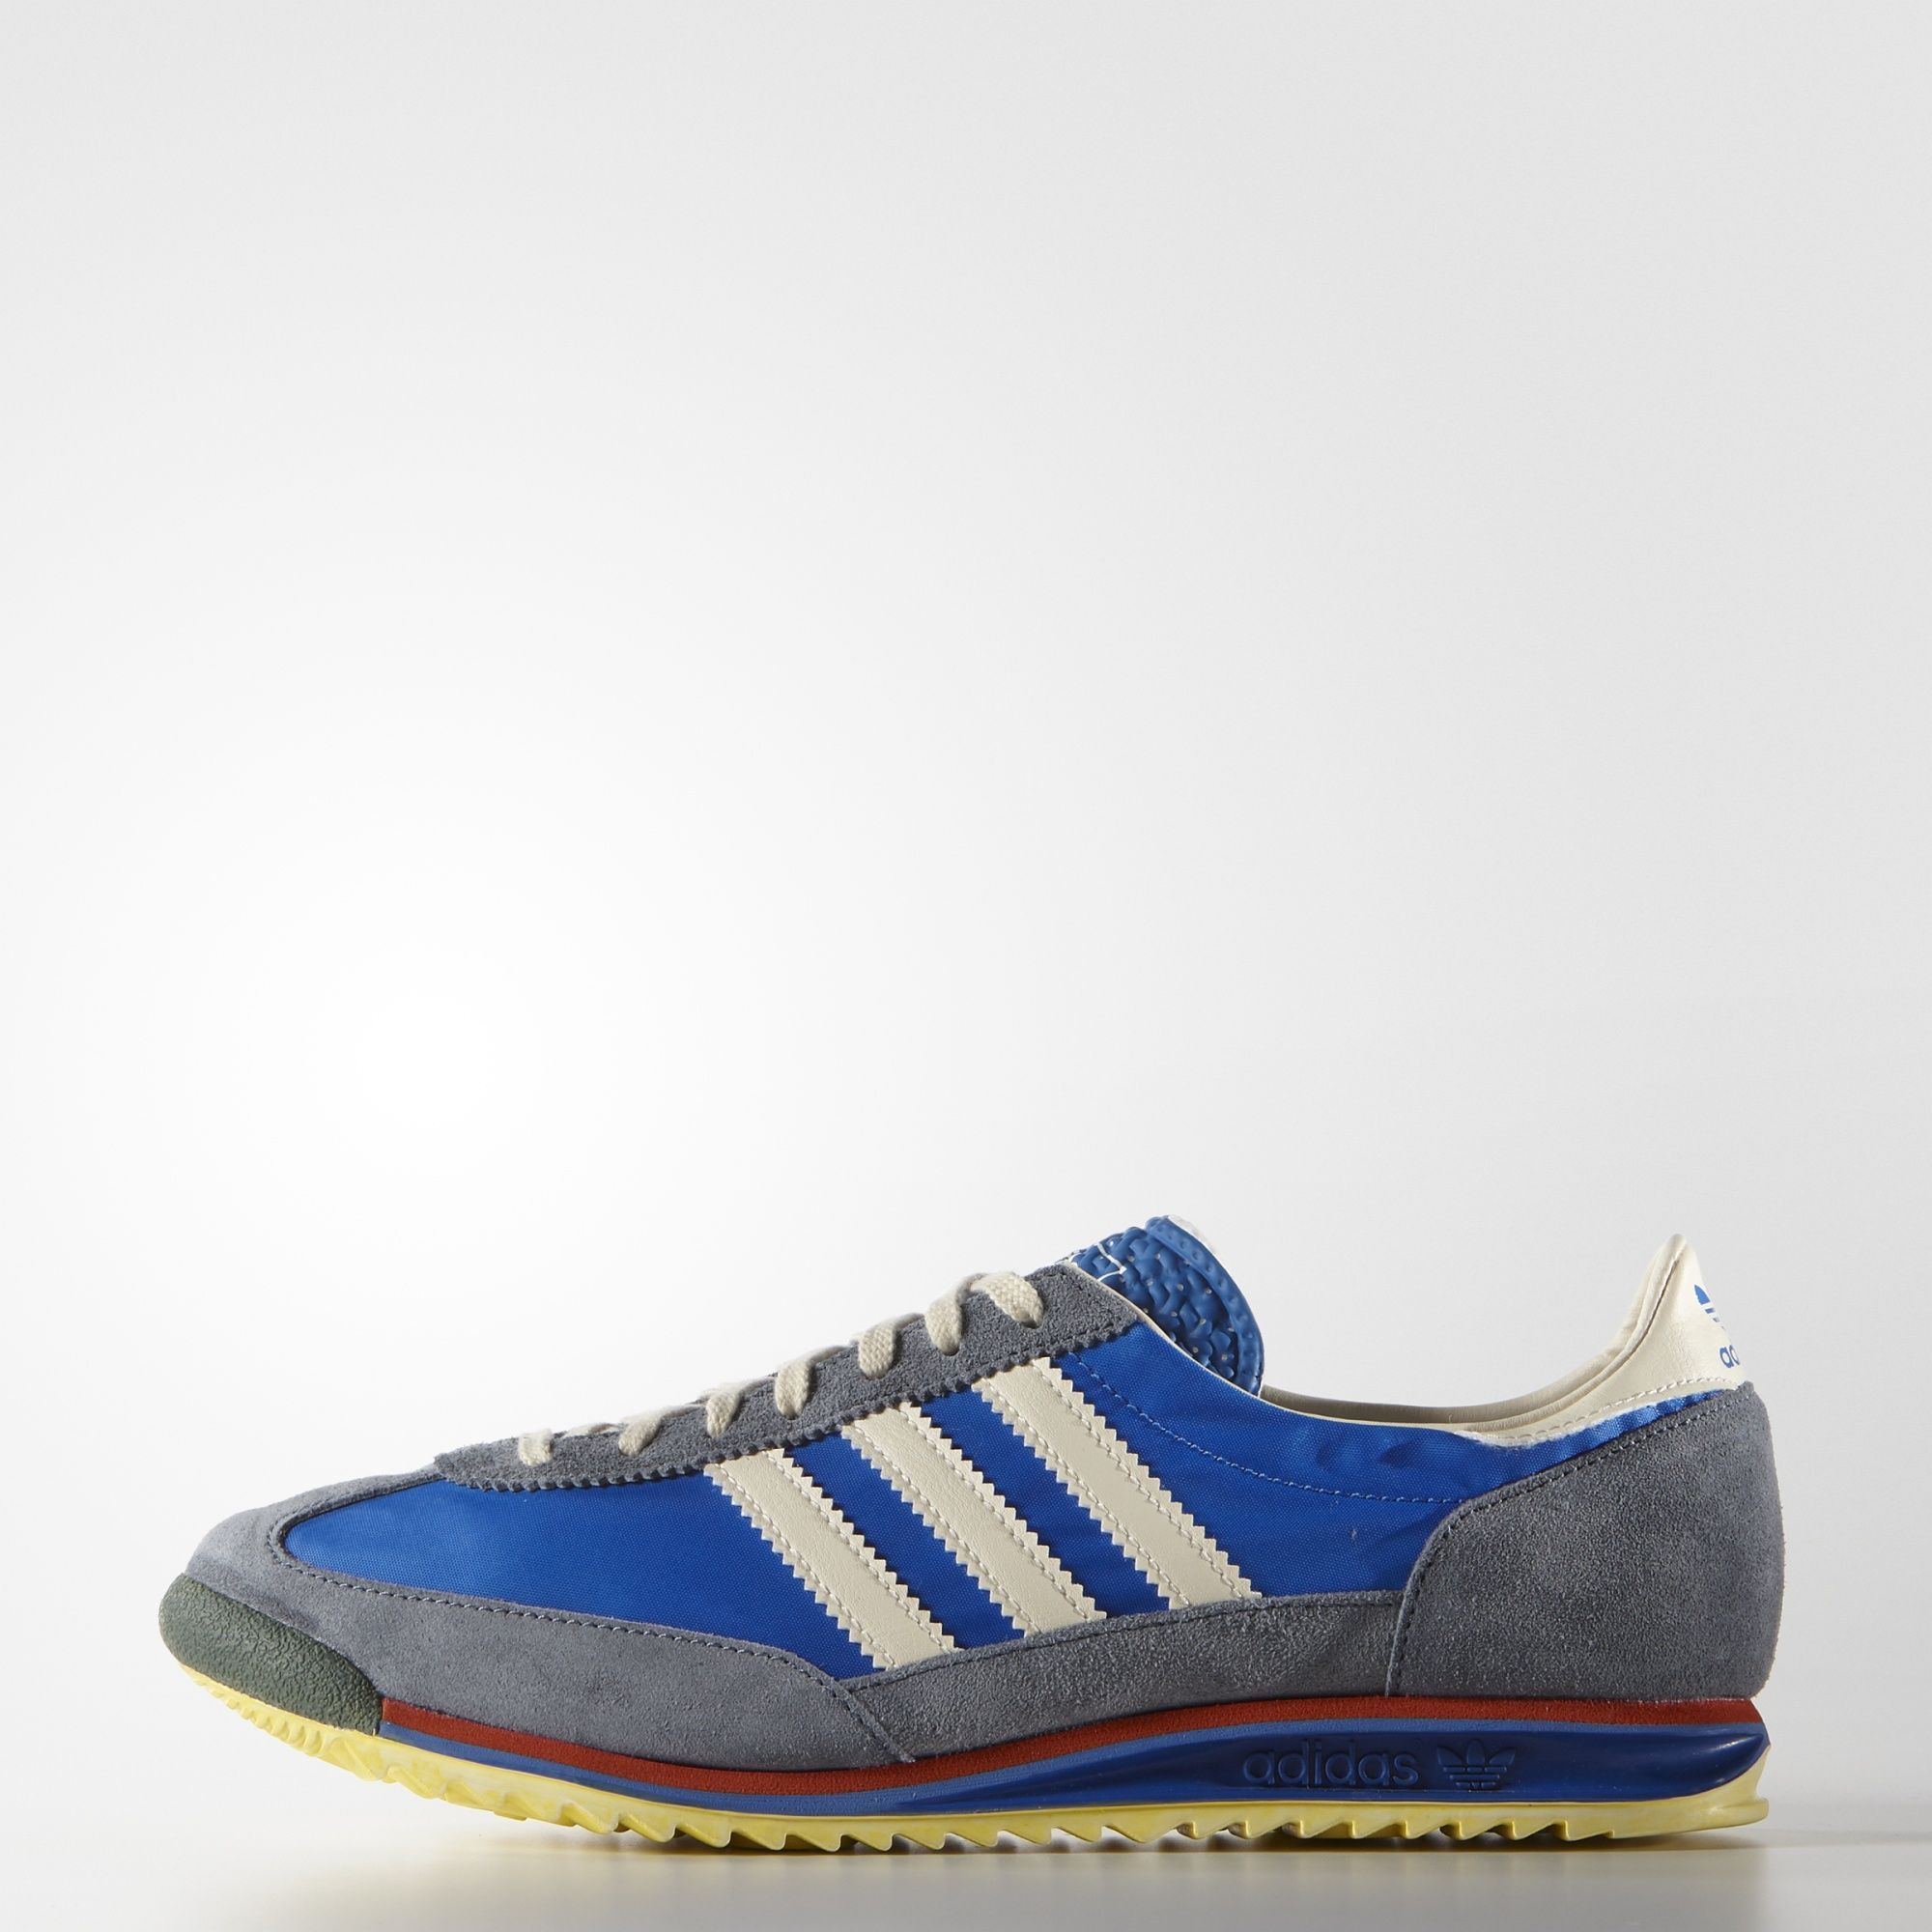 adidas SL 72 Vintage Schoenen | Vintage schoenen, Schoenen